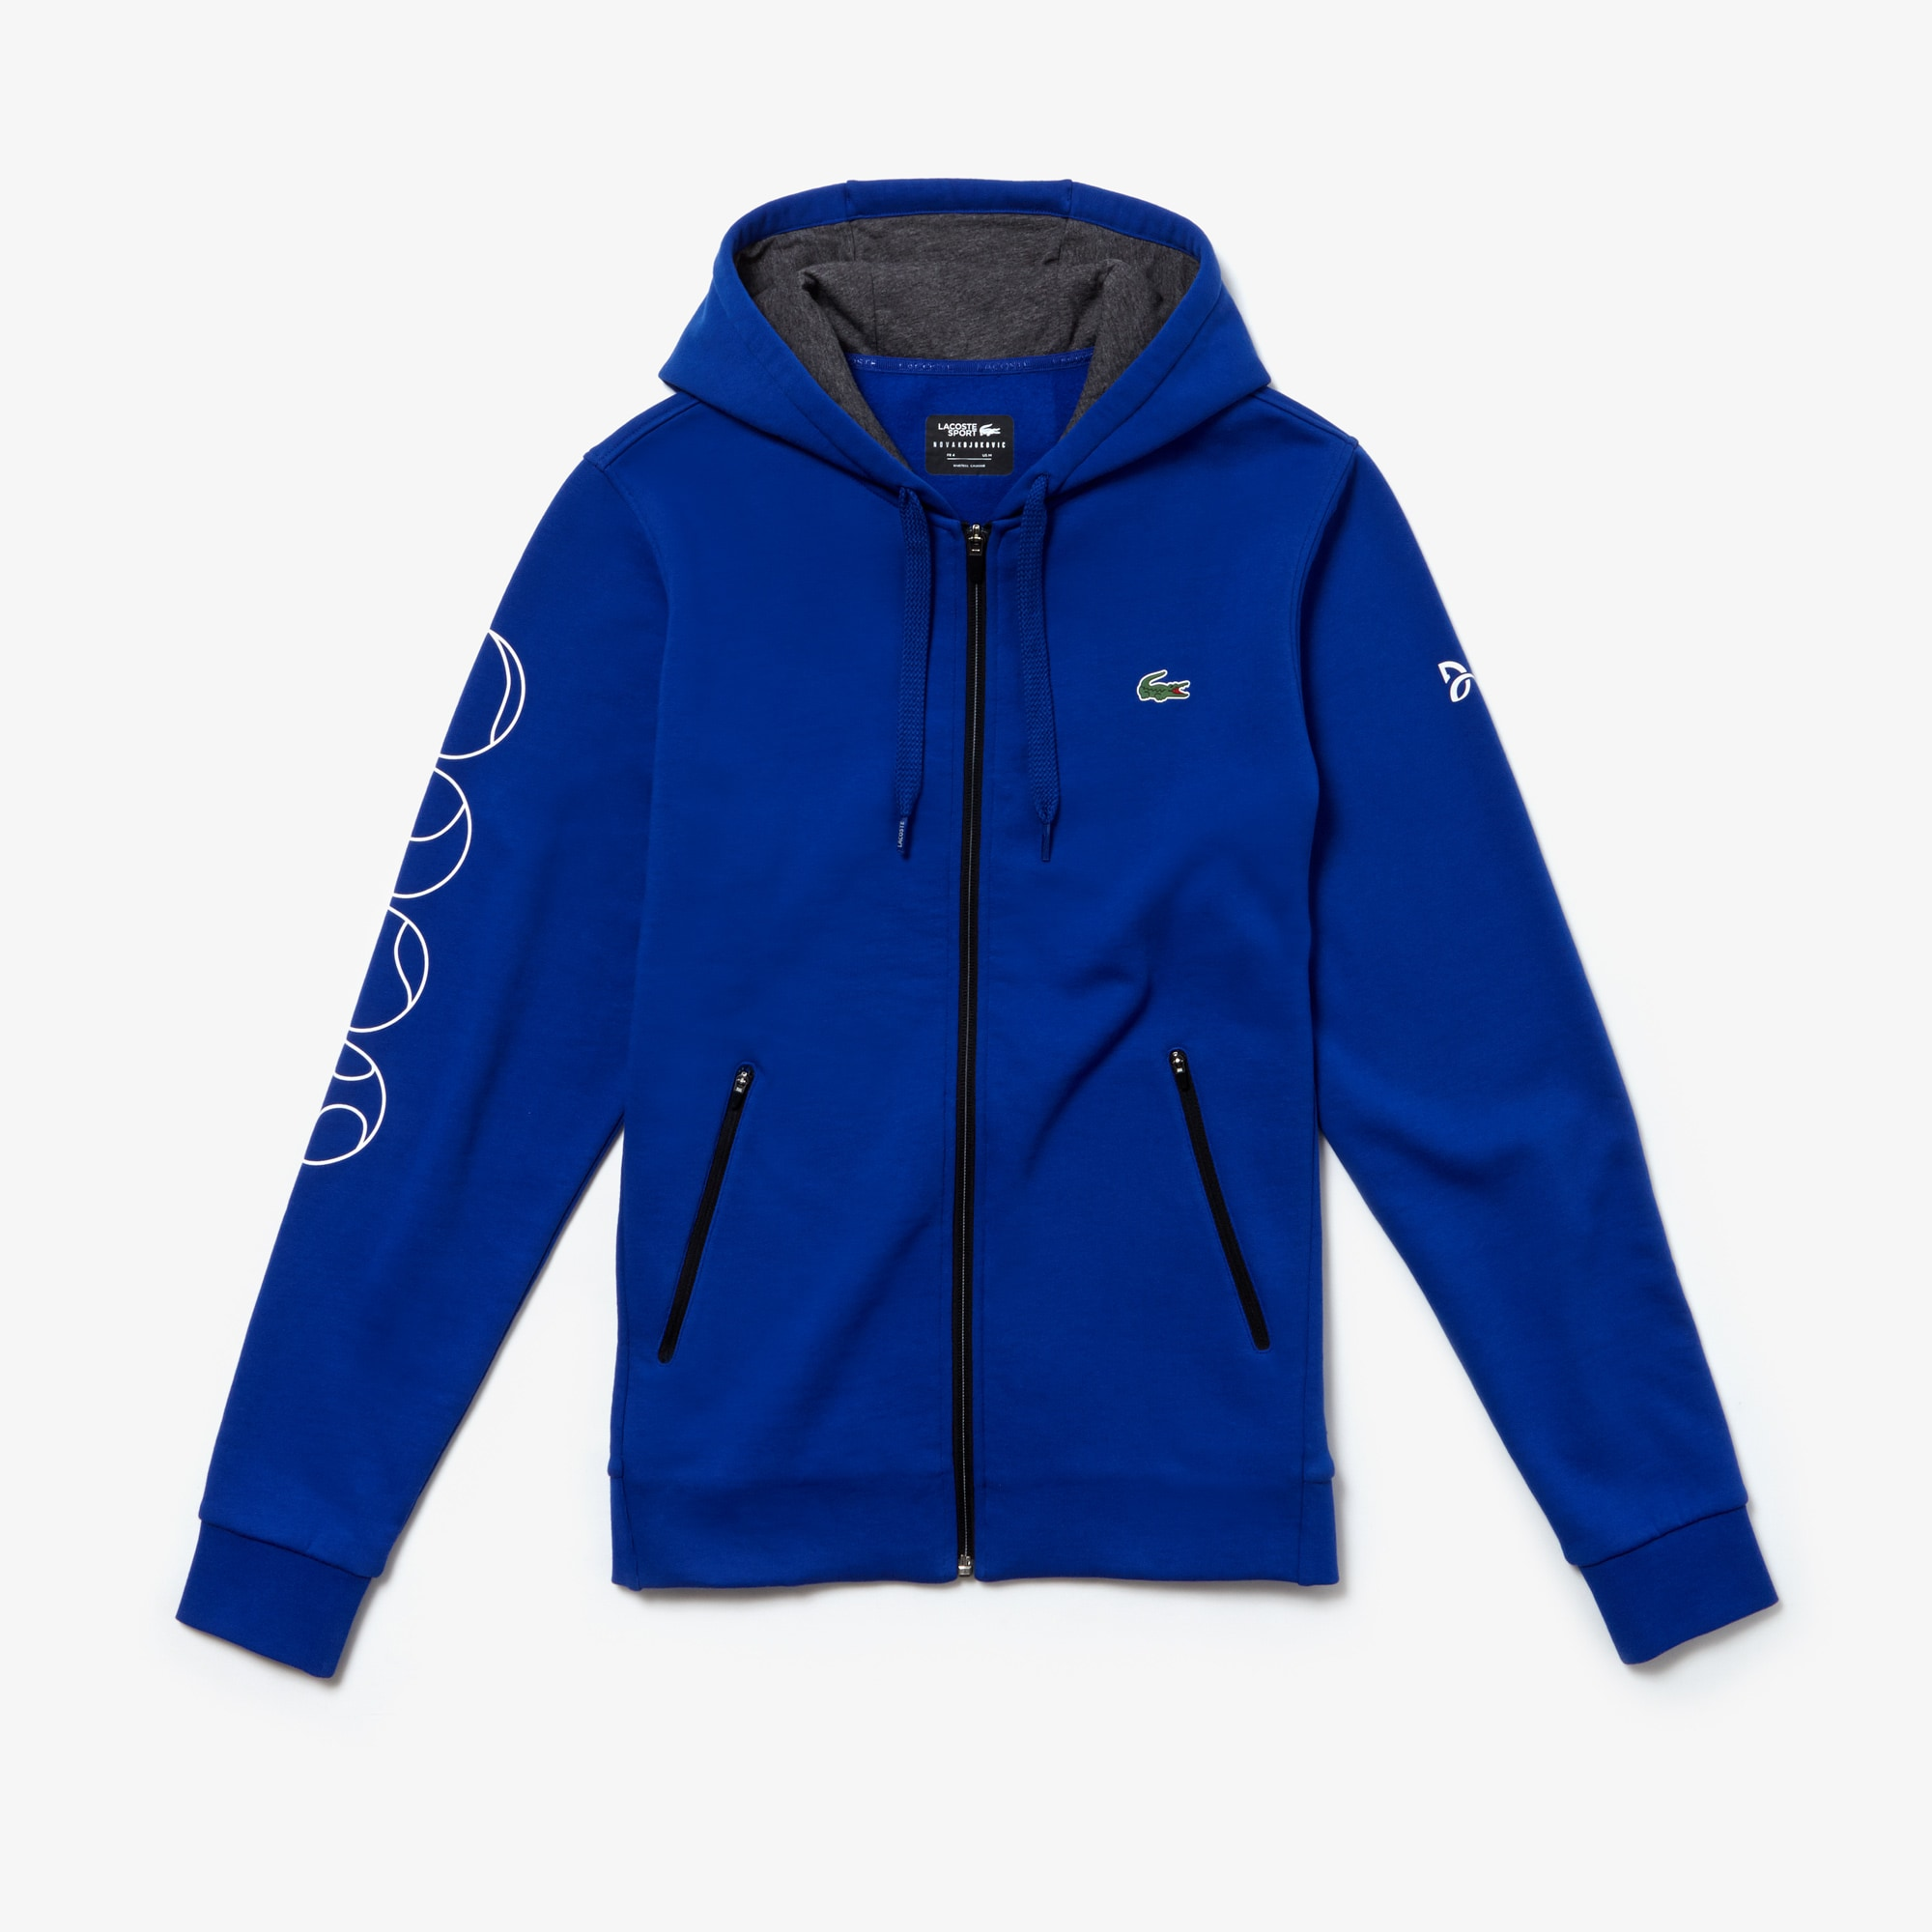 À Sport X Lacoste Zippé Capuche Djokovic Novak Sweatshirt Imprimé y7gYf6bv